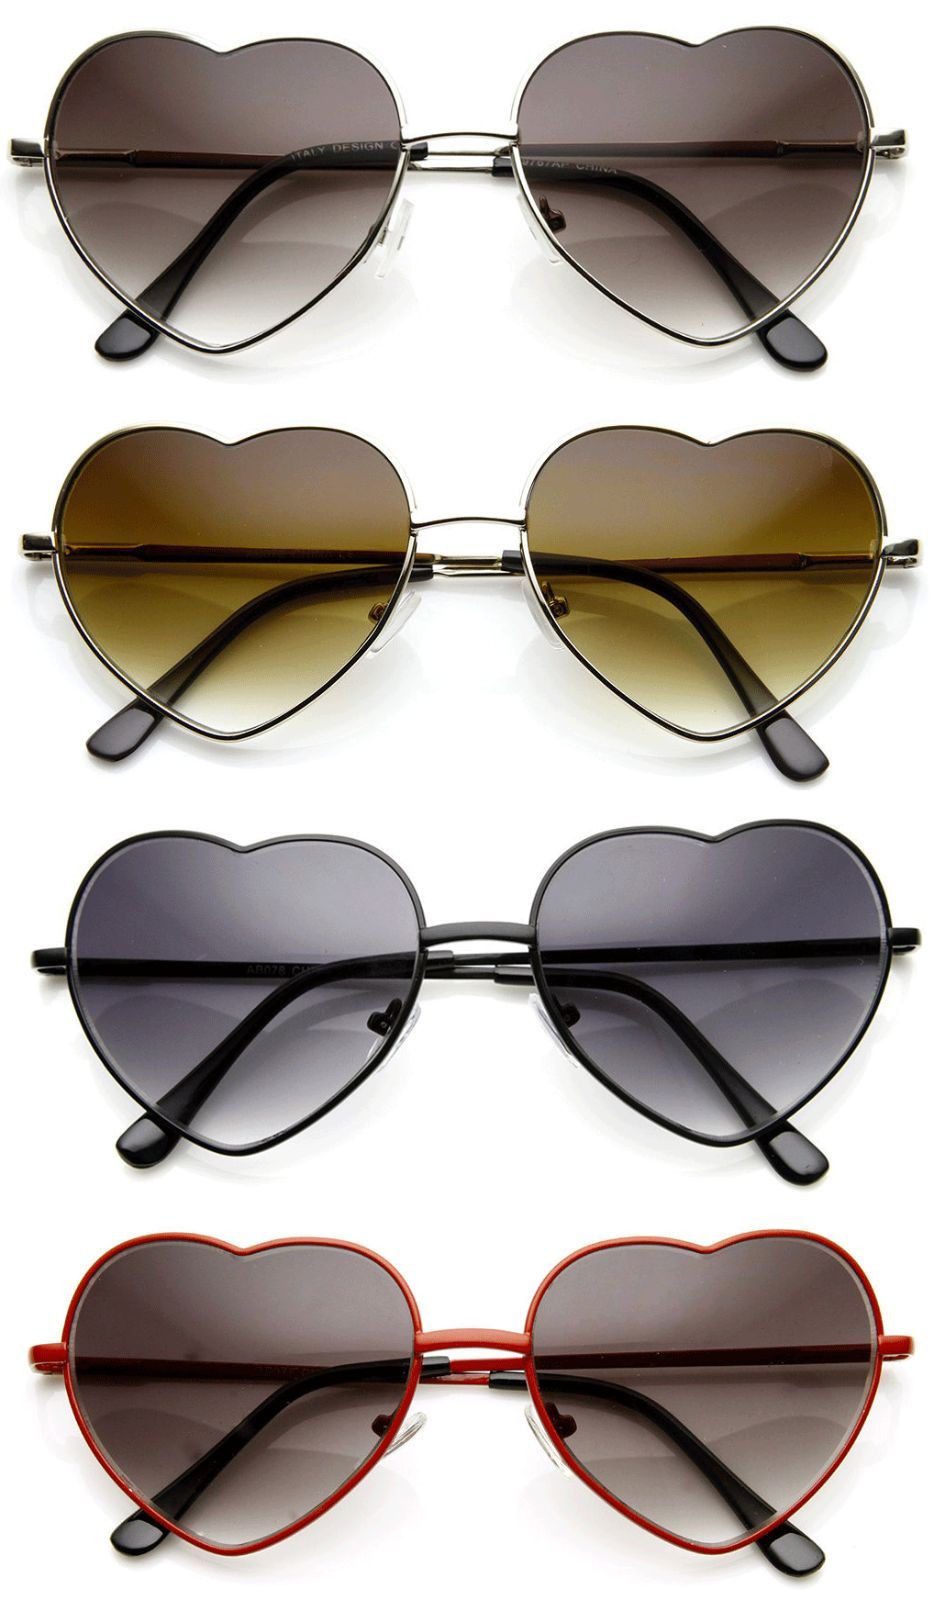 f2f16db50178 Retro Vintage Sunglasses Ebay - Restaurant and Palinka Bar